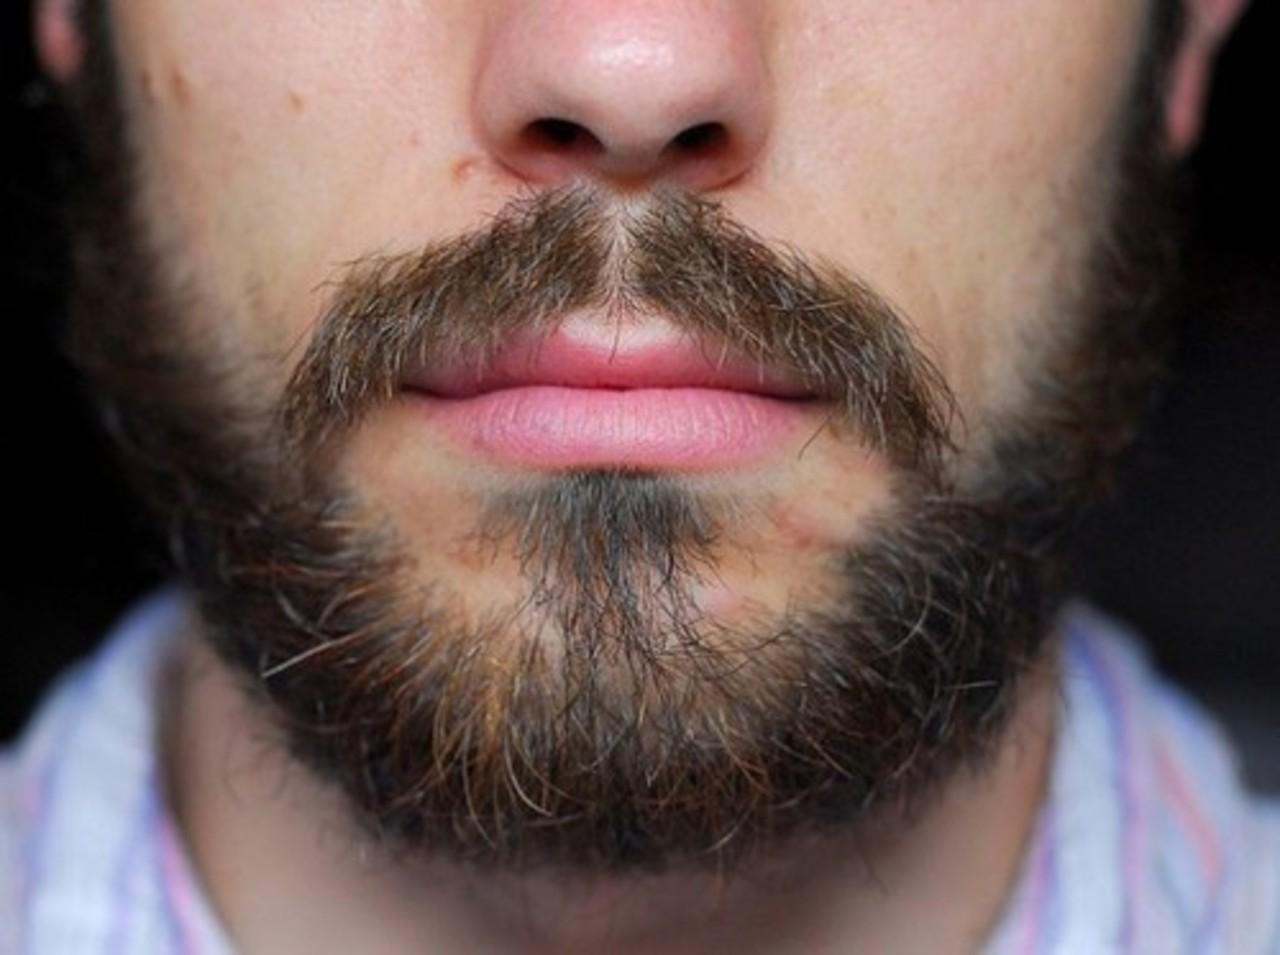 усы растут а борода нет